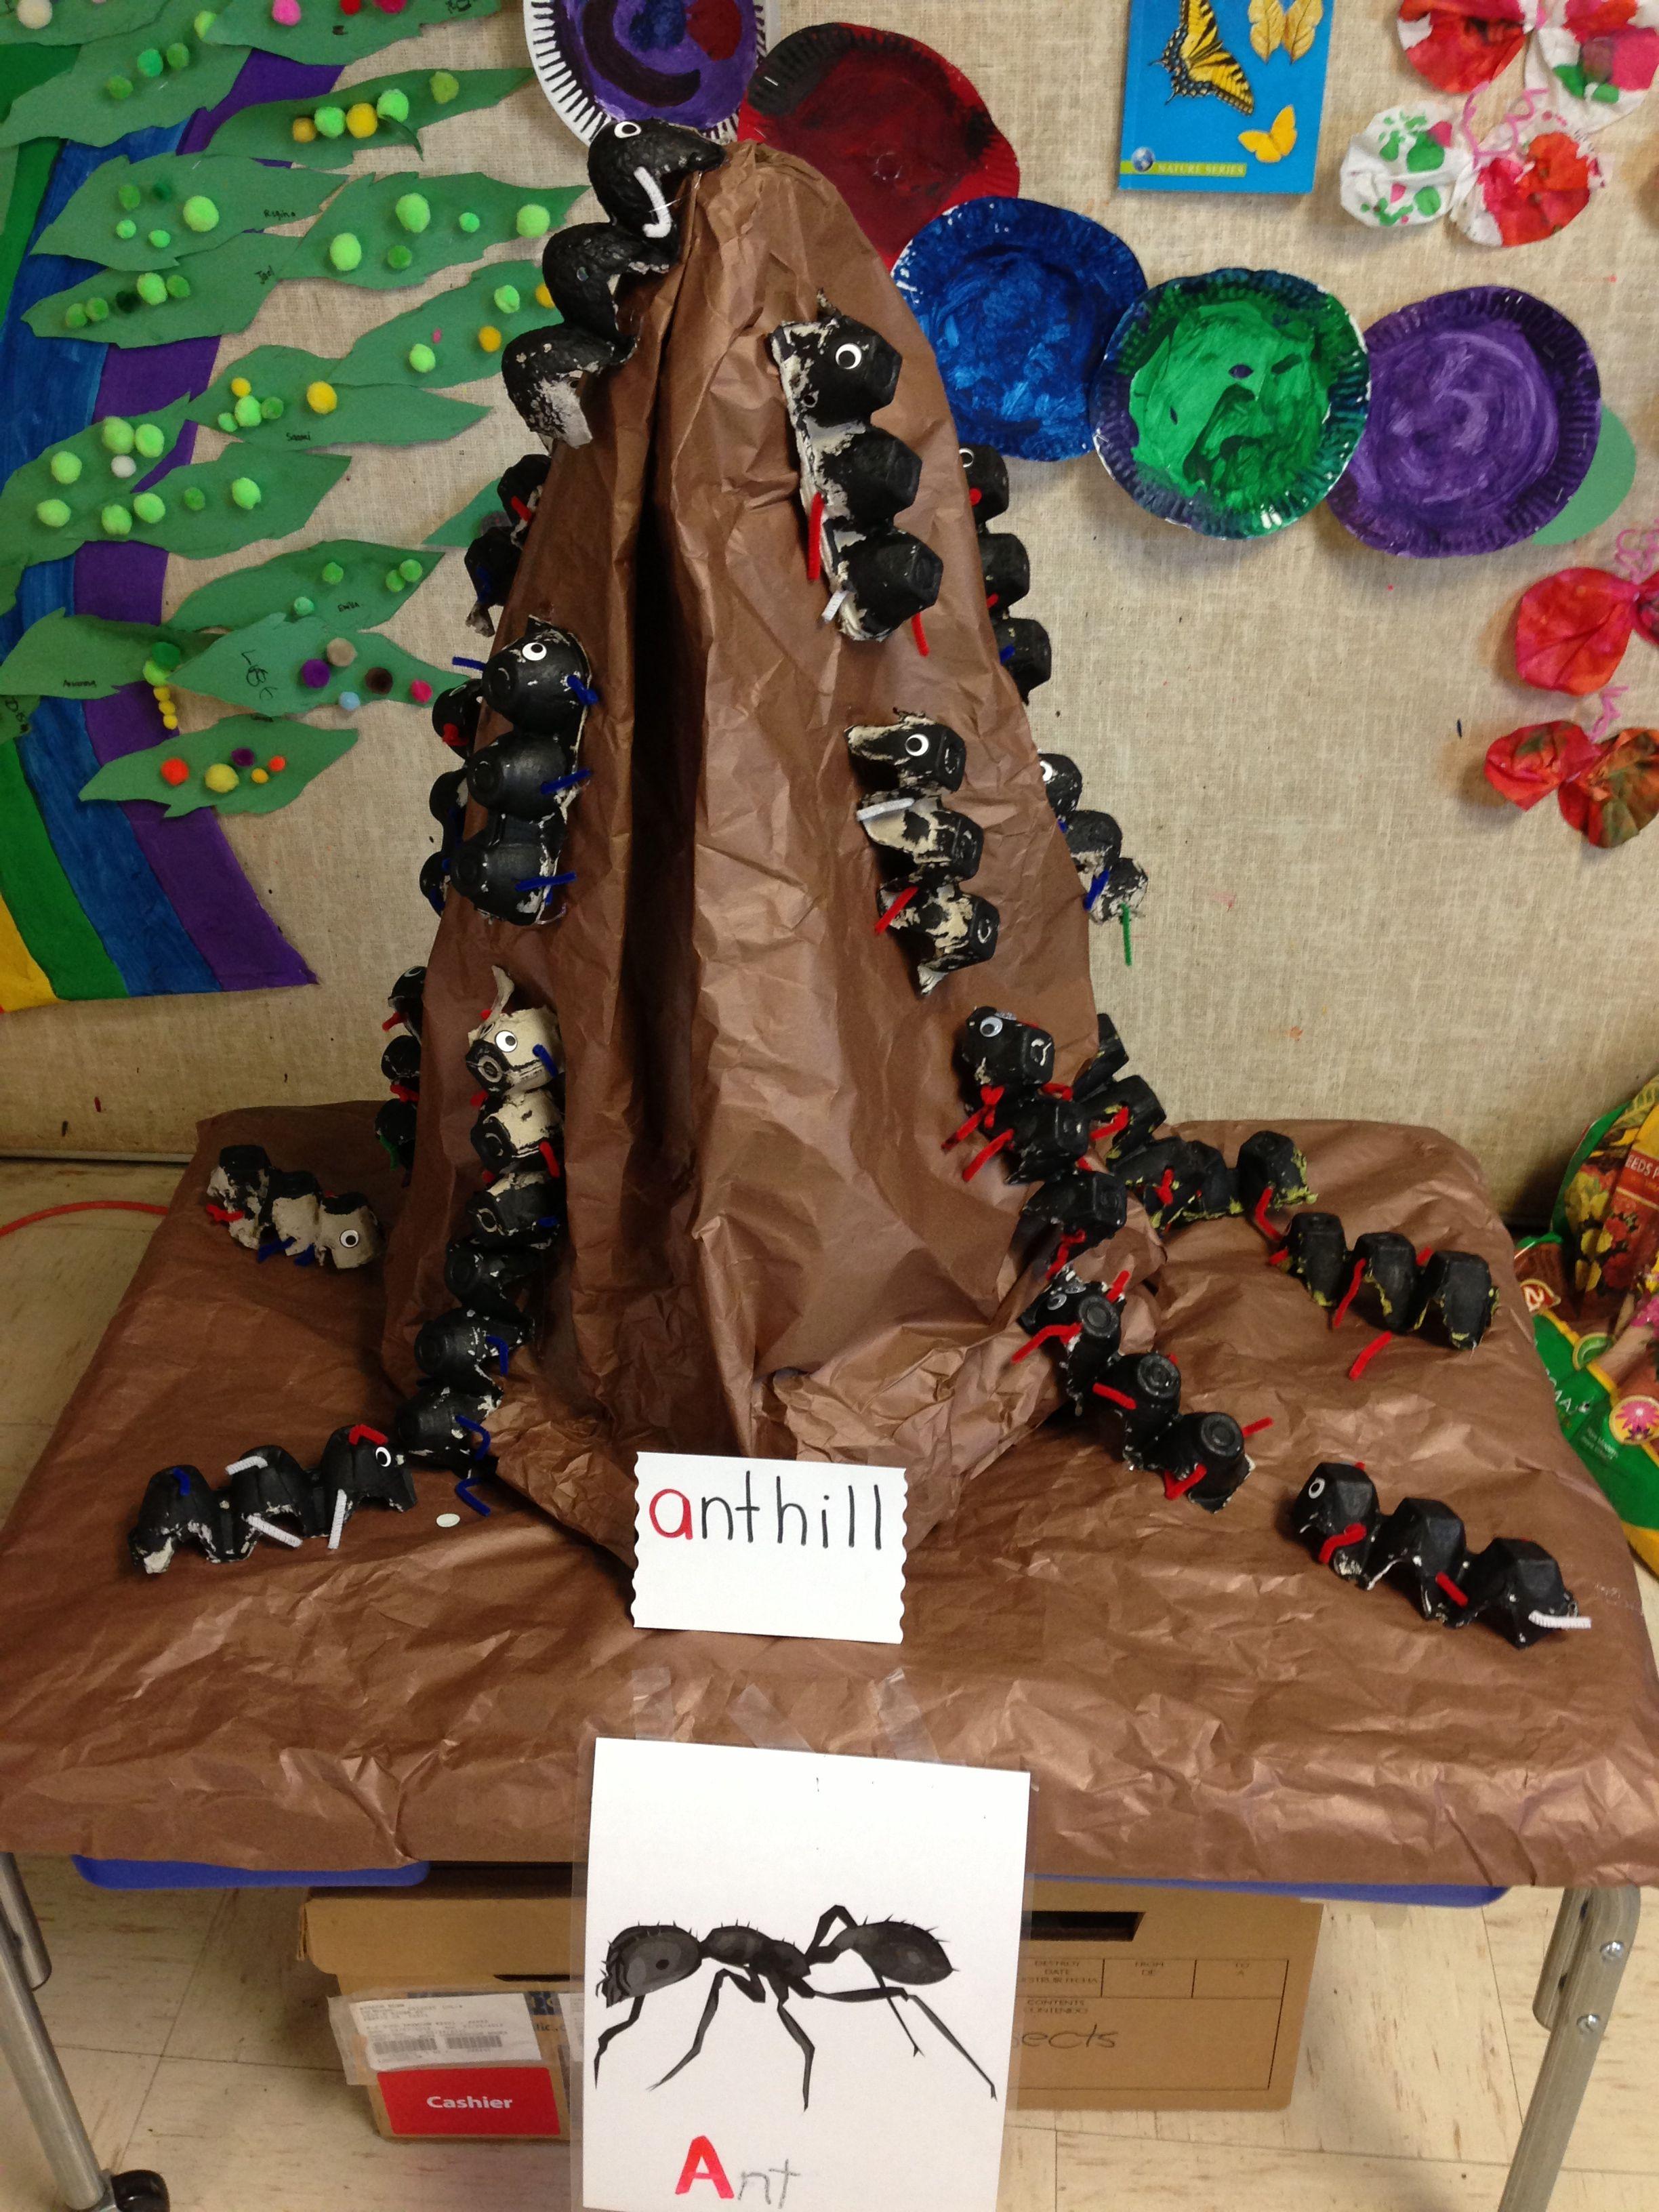 Egg Carton Ants For Preschoolers To Create